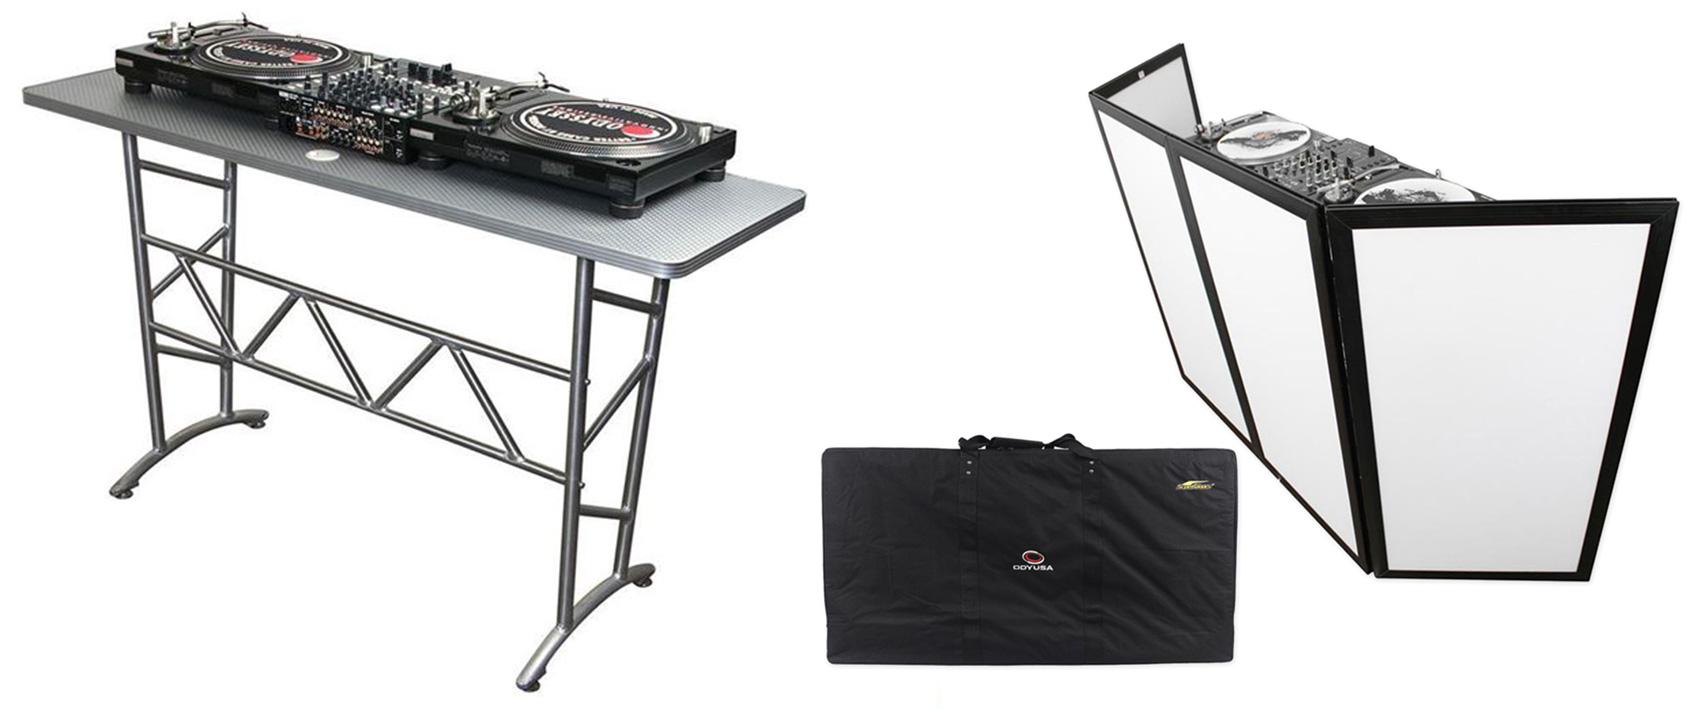 Odyssey ATT DJ Table + Scrim Werks SWF4846B Faade Barrier by Odyssey